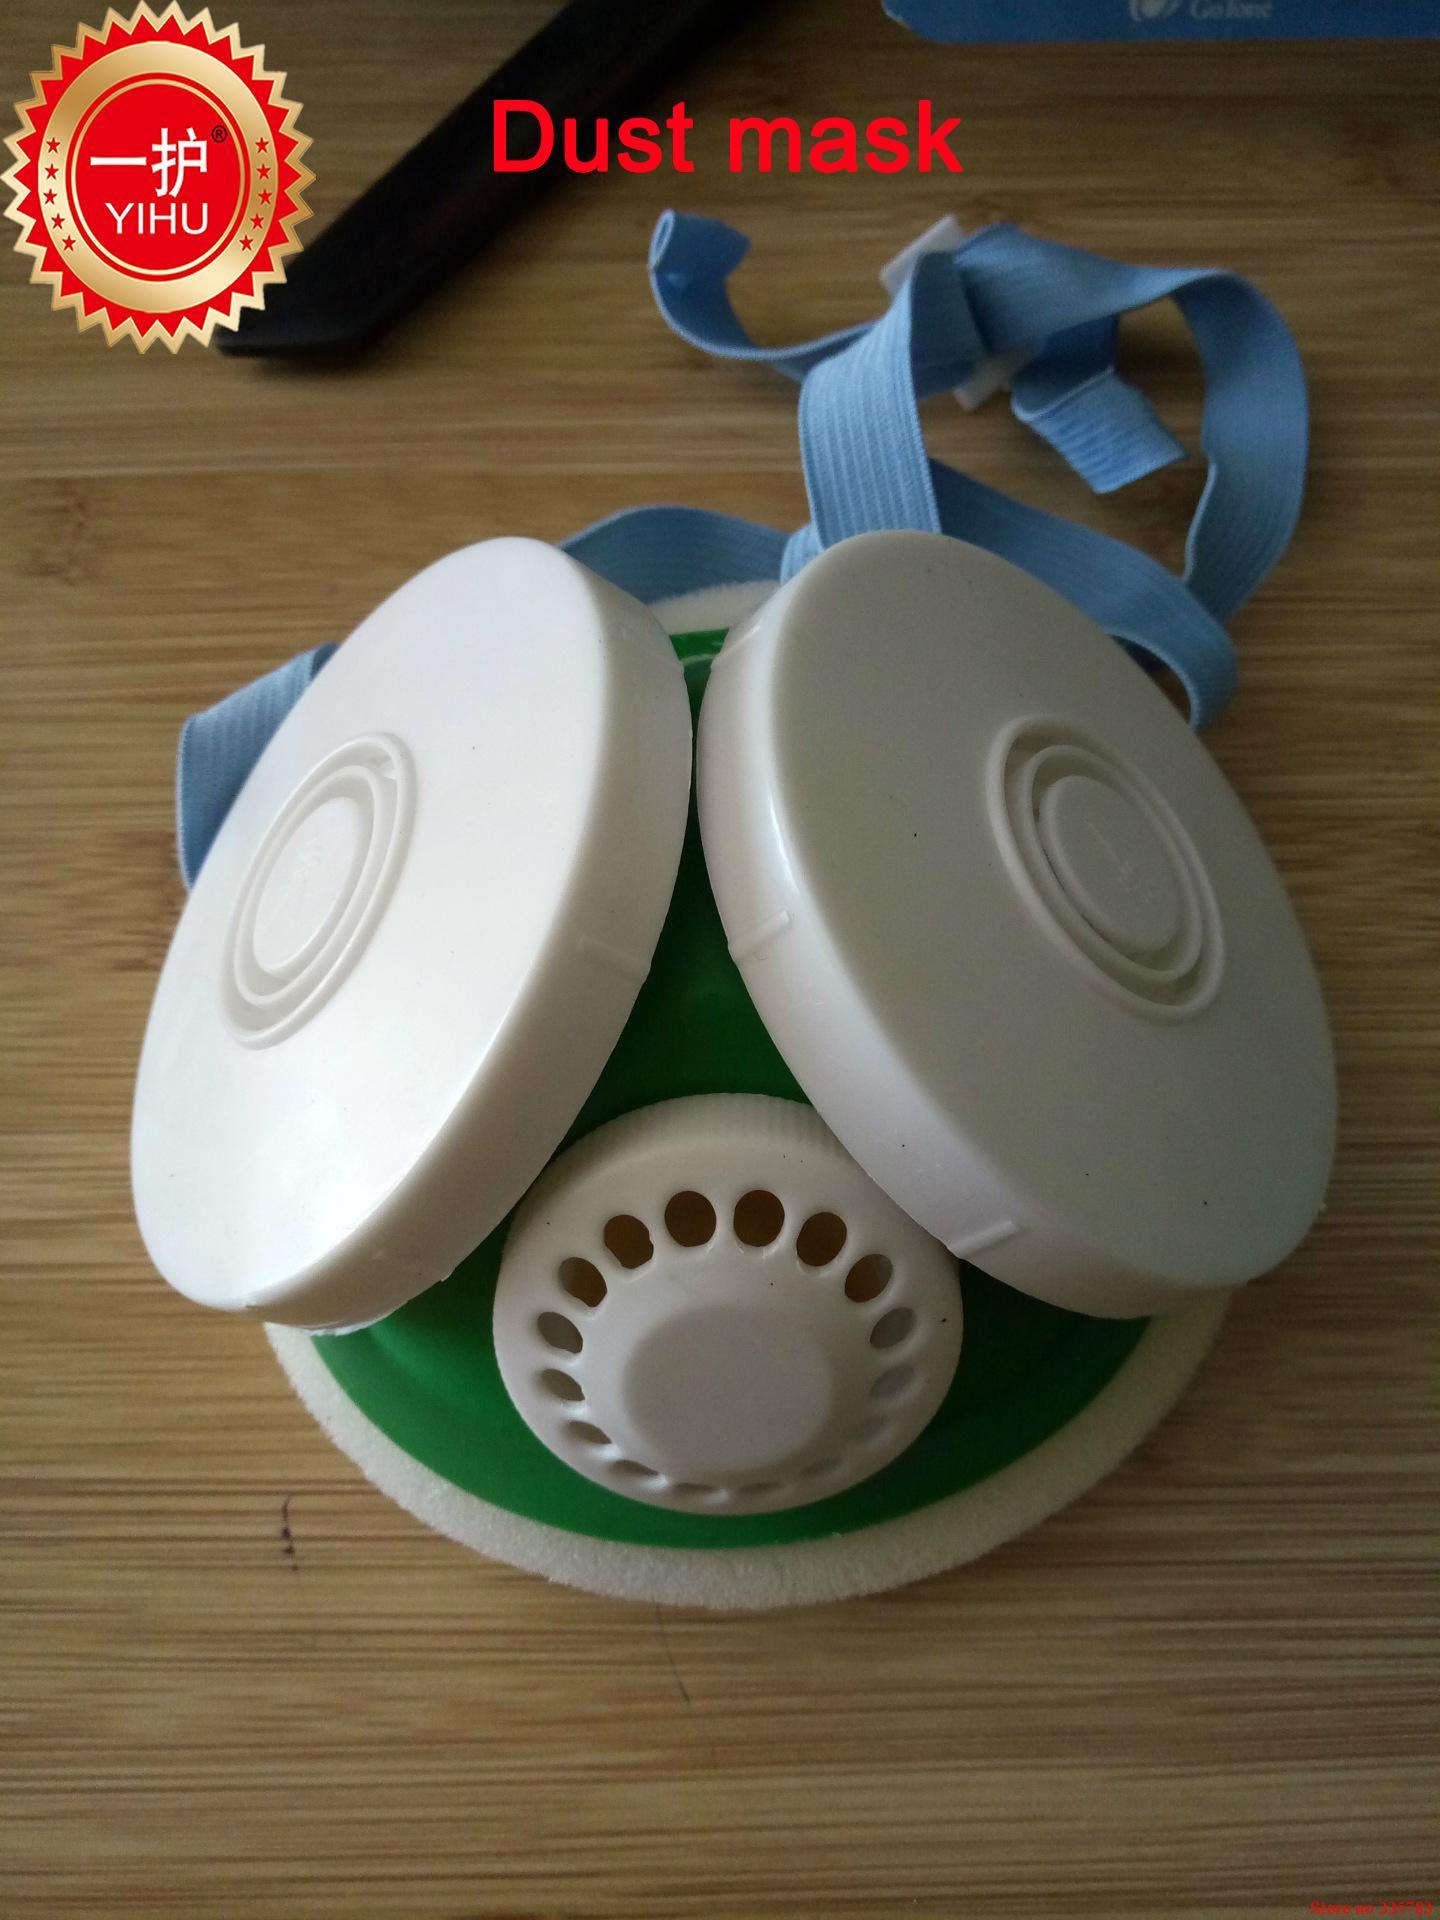 YIHU Professional Dust mask protective equipment mask gas